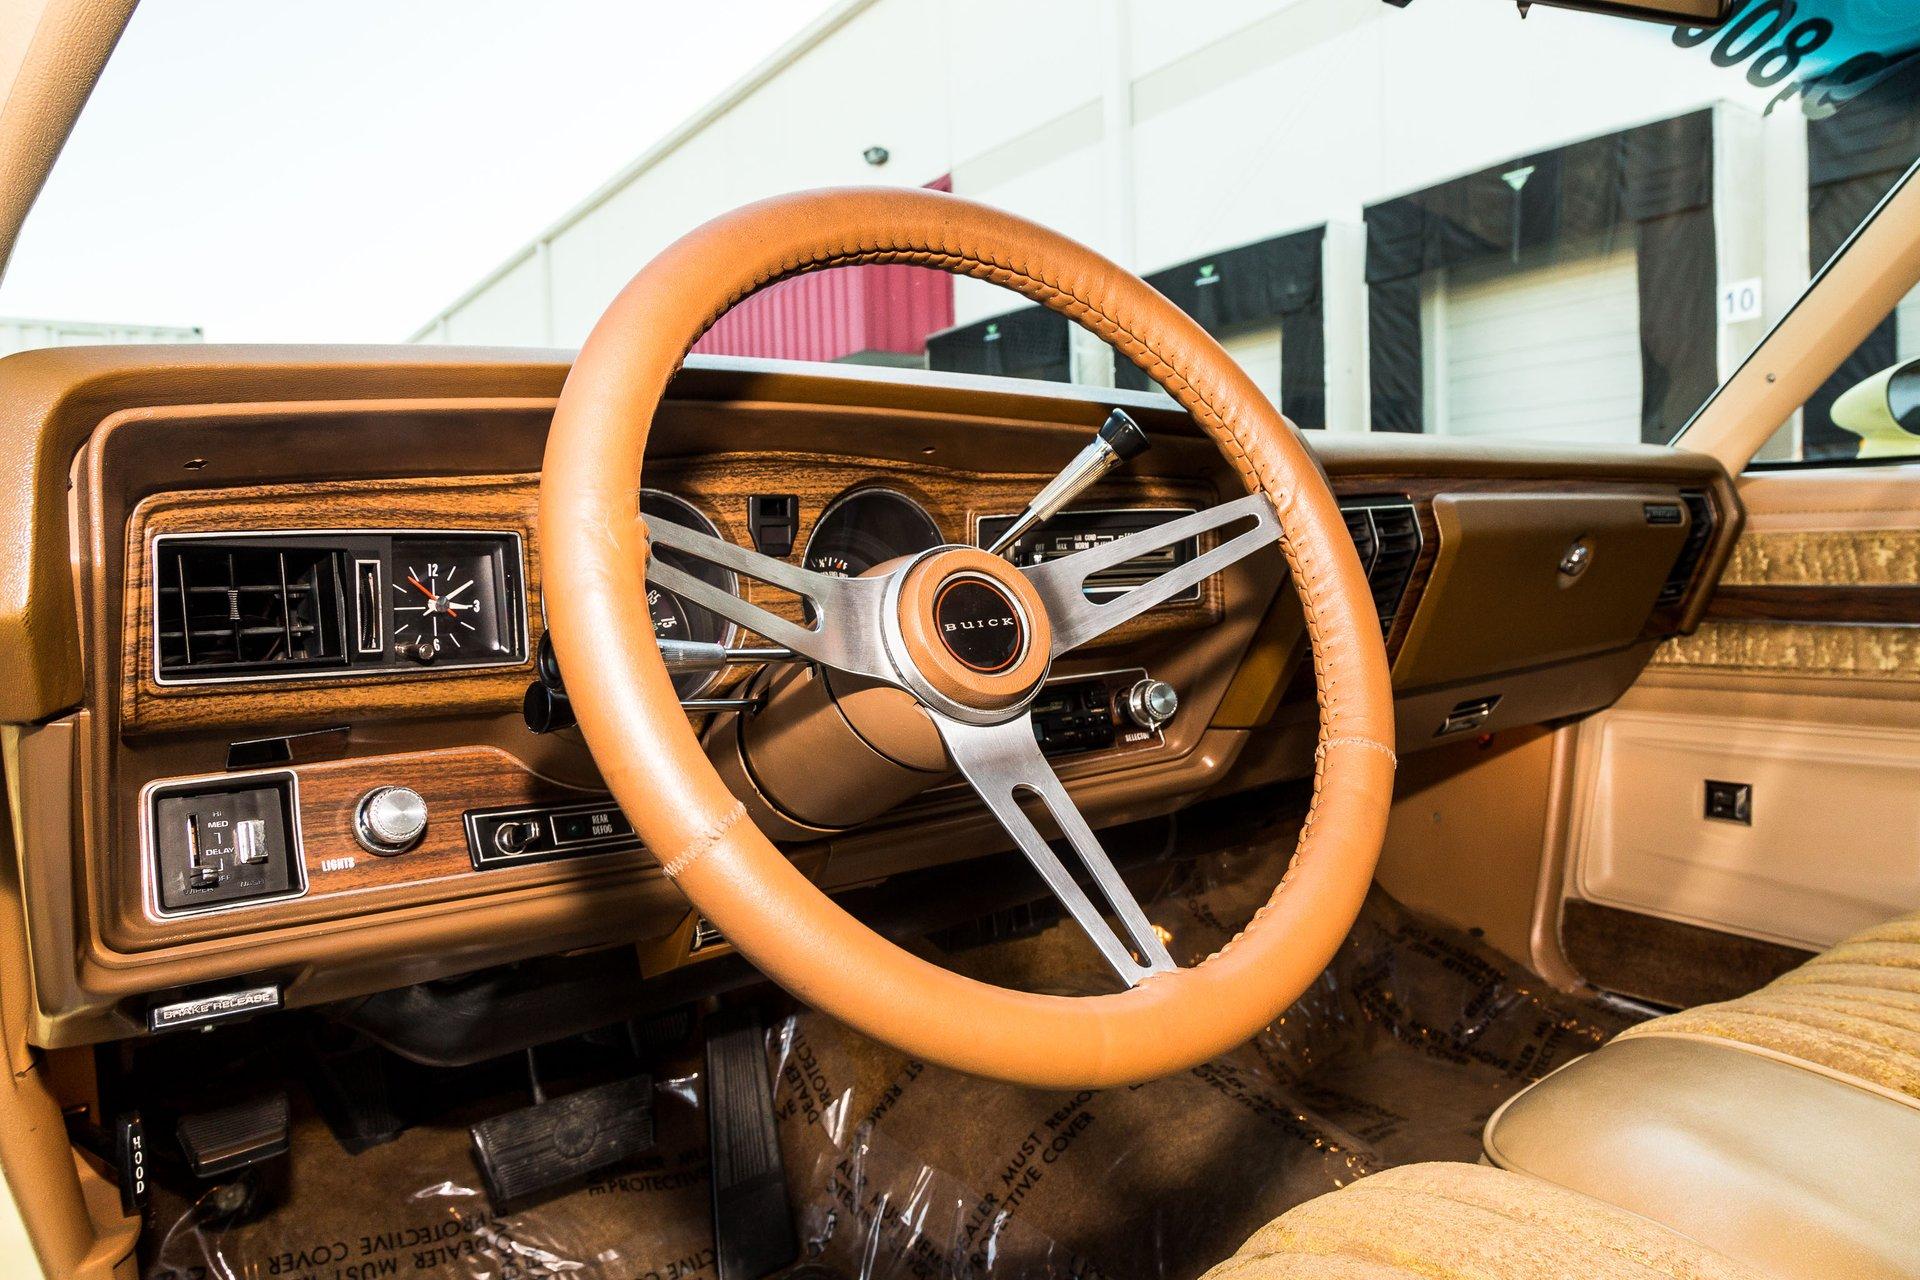 1977 buick regal landau orlando classic cars 1977 buick regal landau orlando